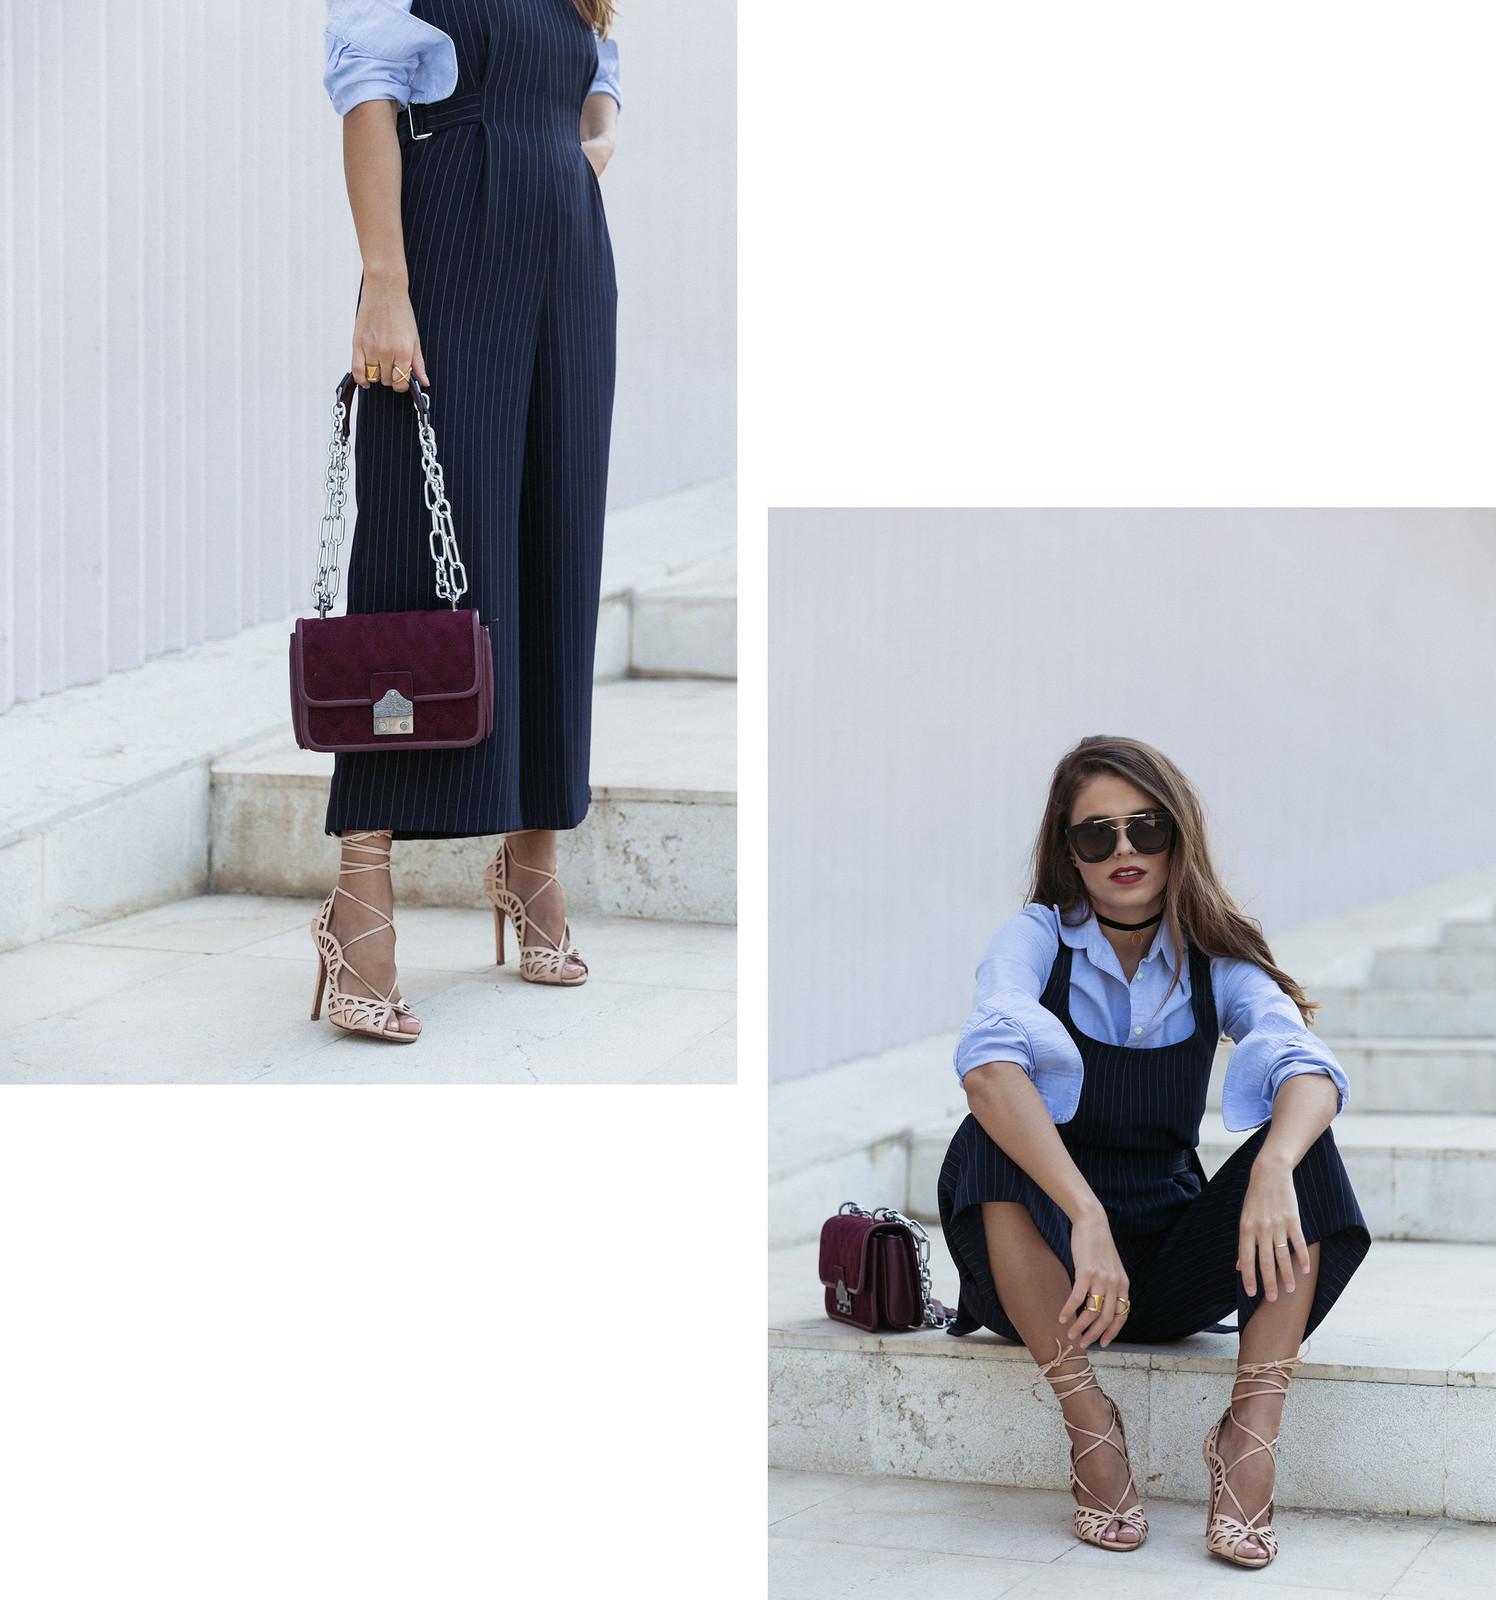 Jessie Chanes Seams for a desire - Pinstripped suit topshop heeled sandals schutz parfois bag  -10